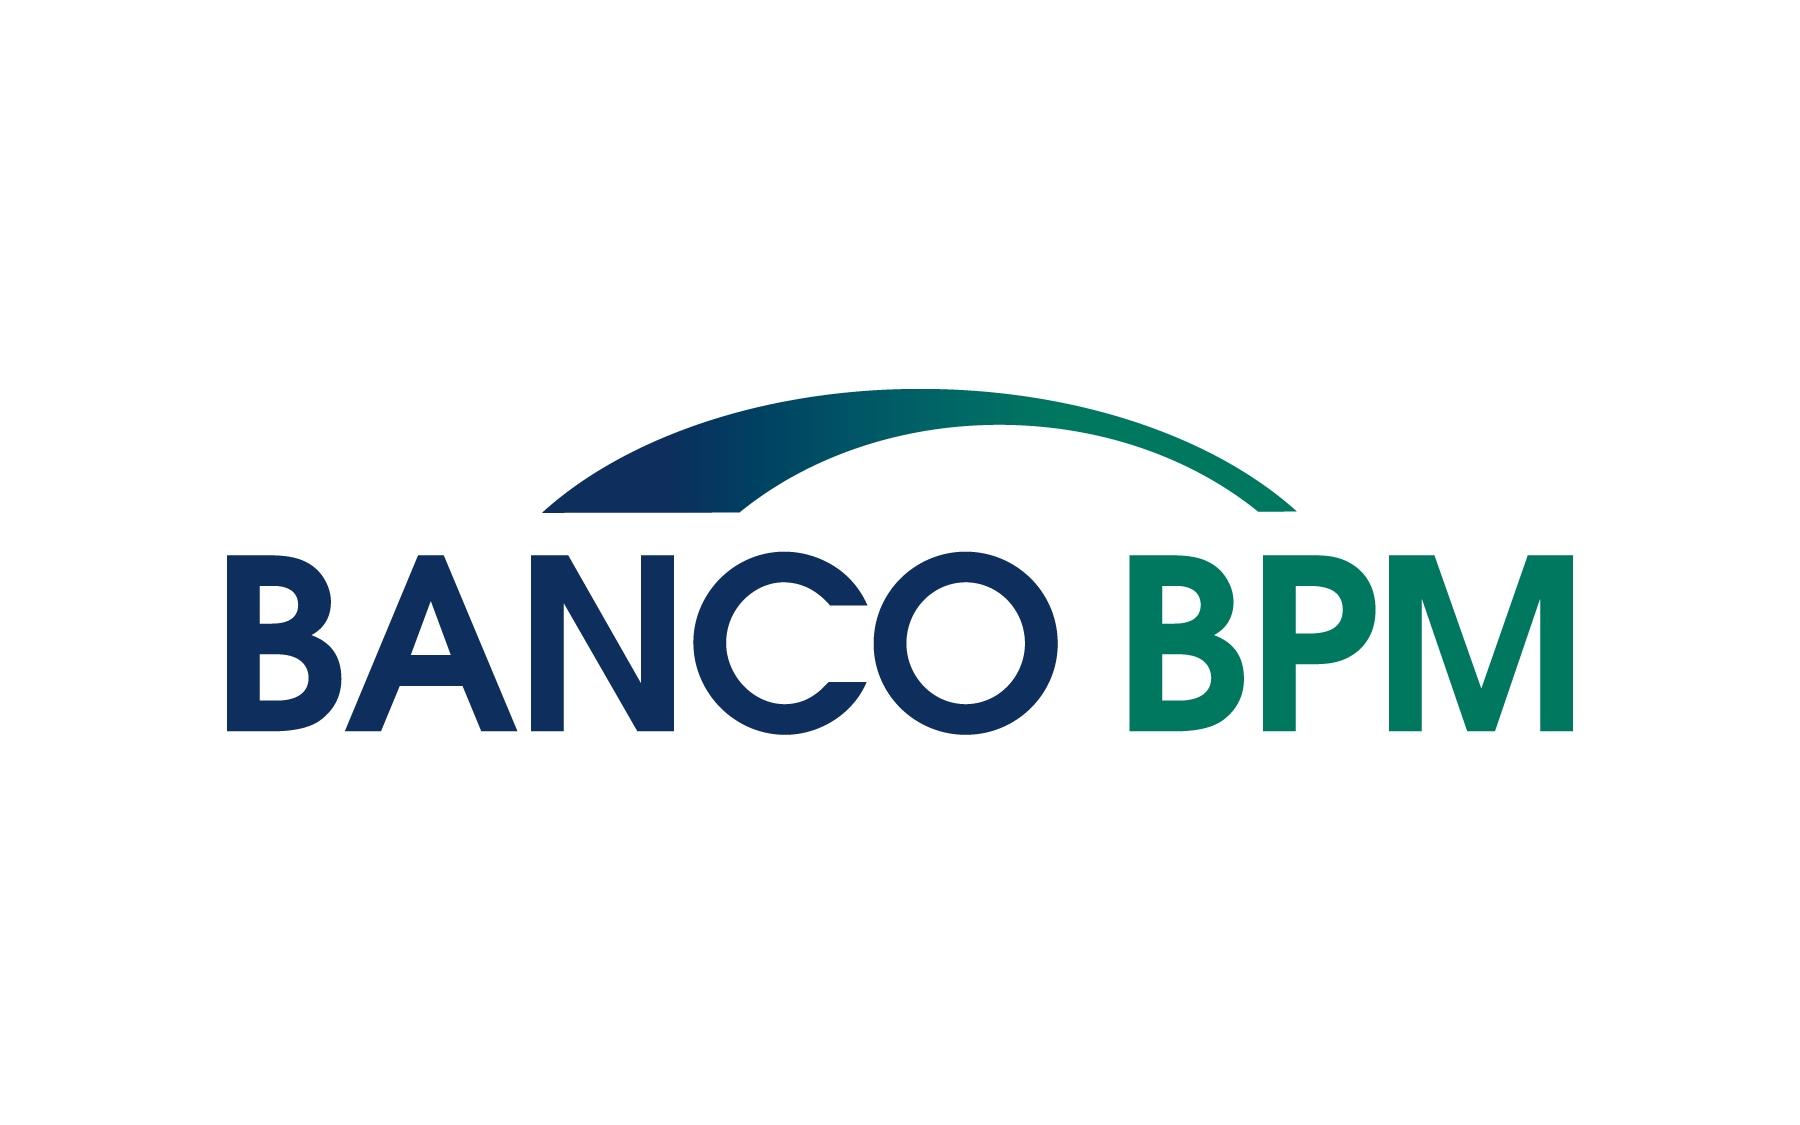 Banco Bpm HiRes